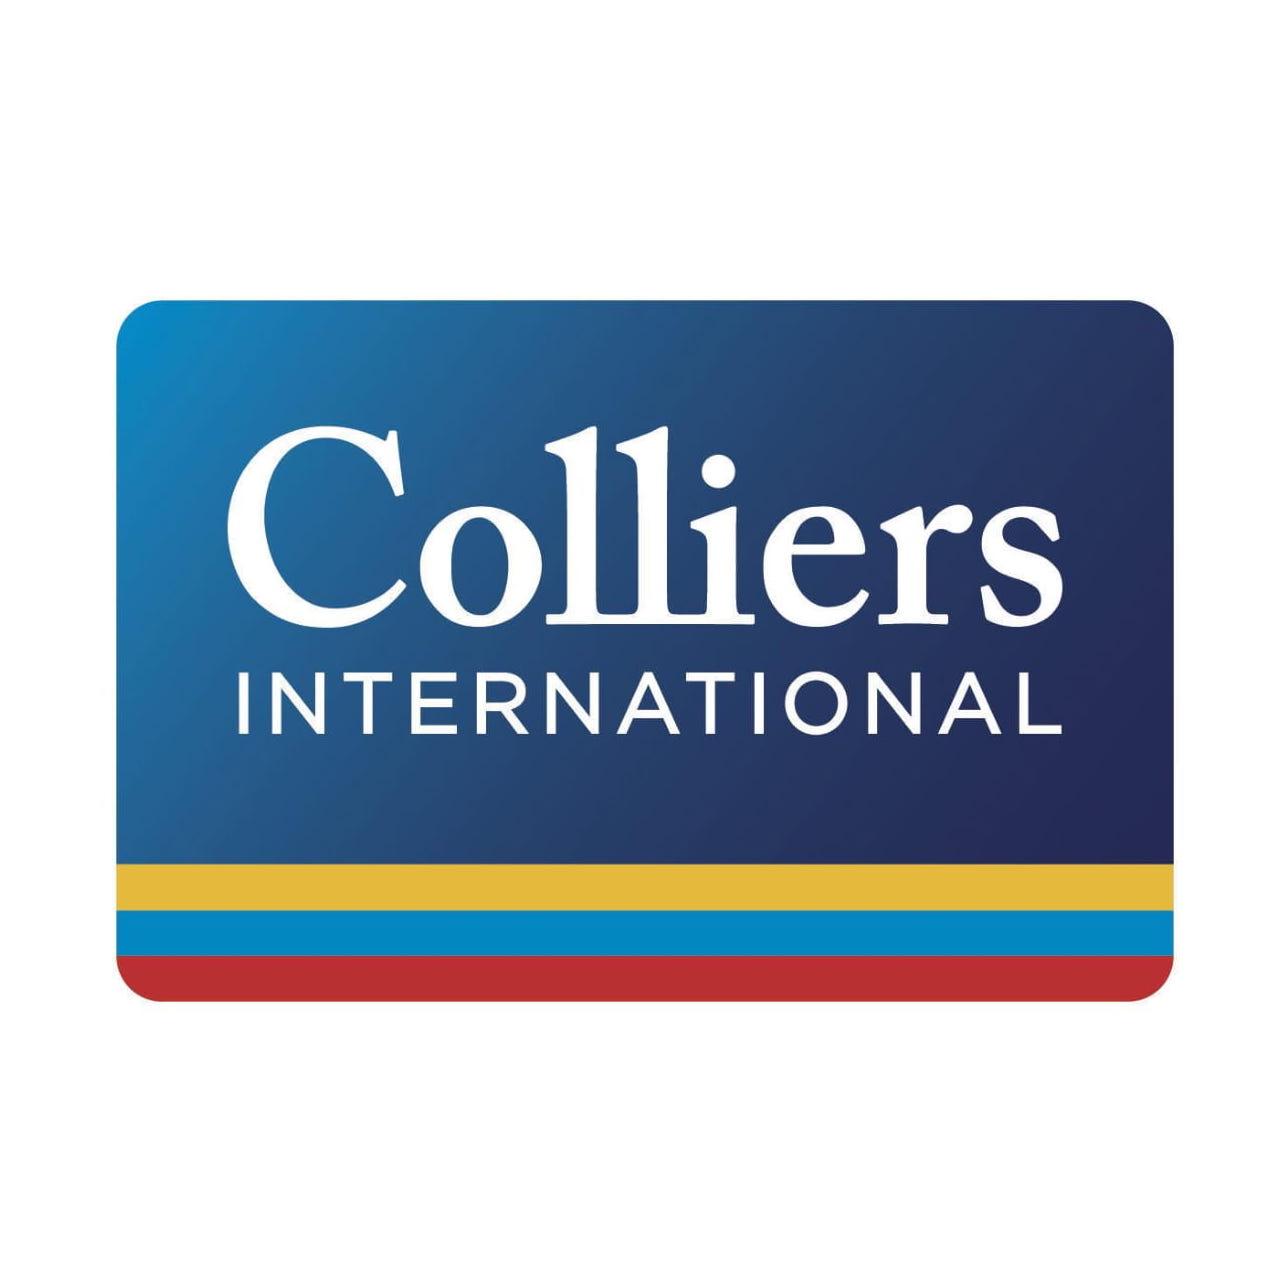 Colliers-1.jpg